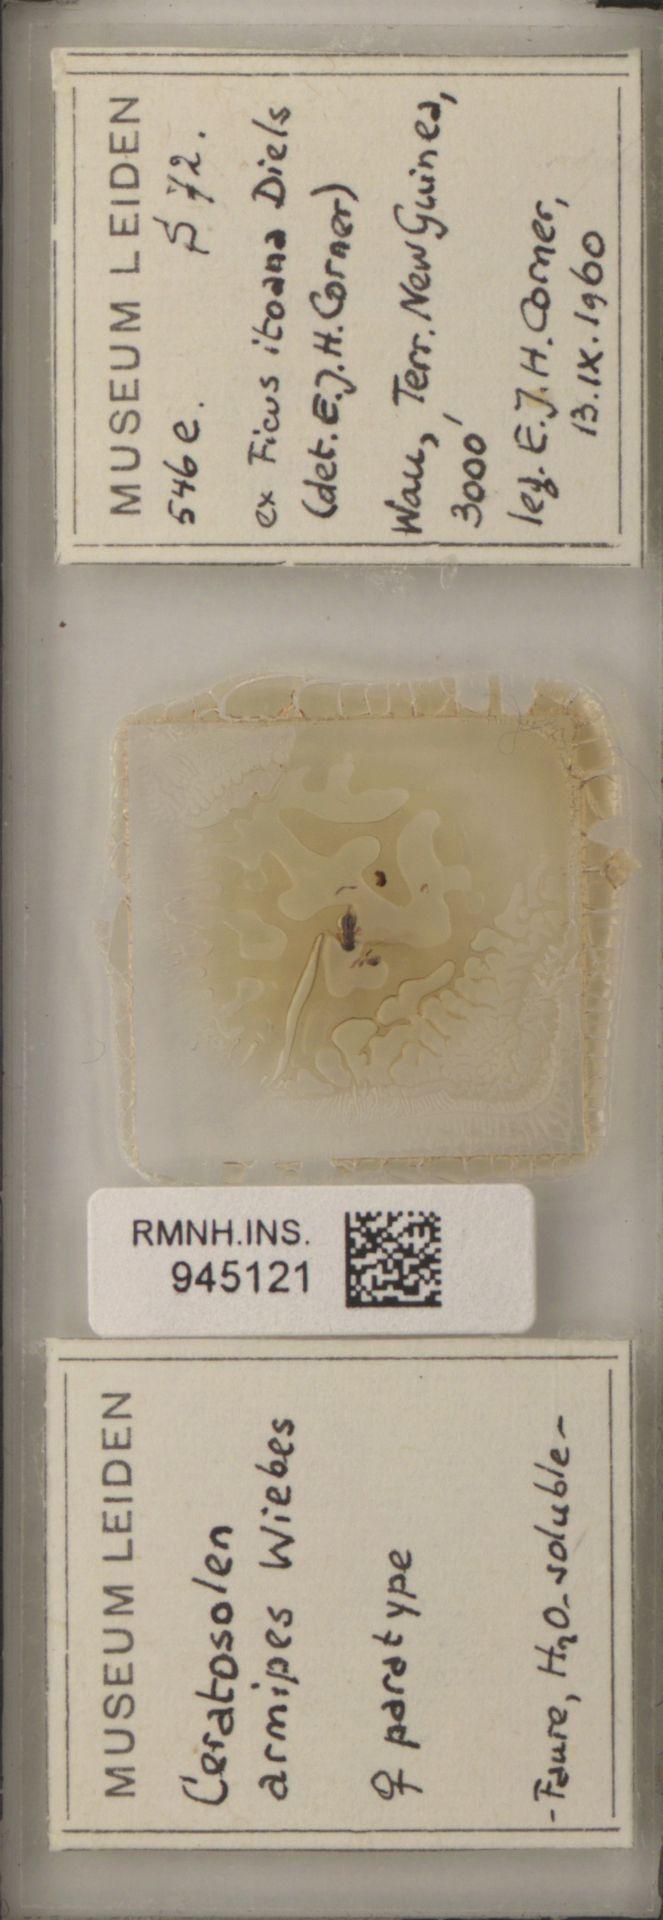 RMNH.INS.945121   Ceratosolen armipes Wiebes